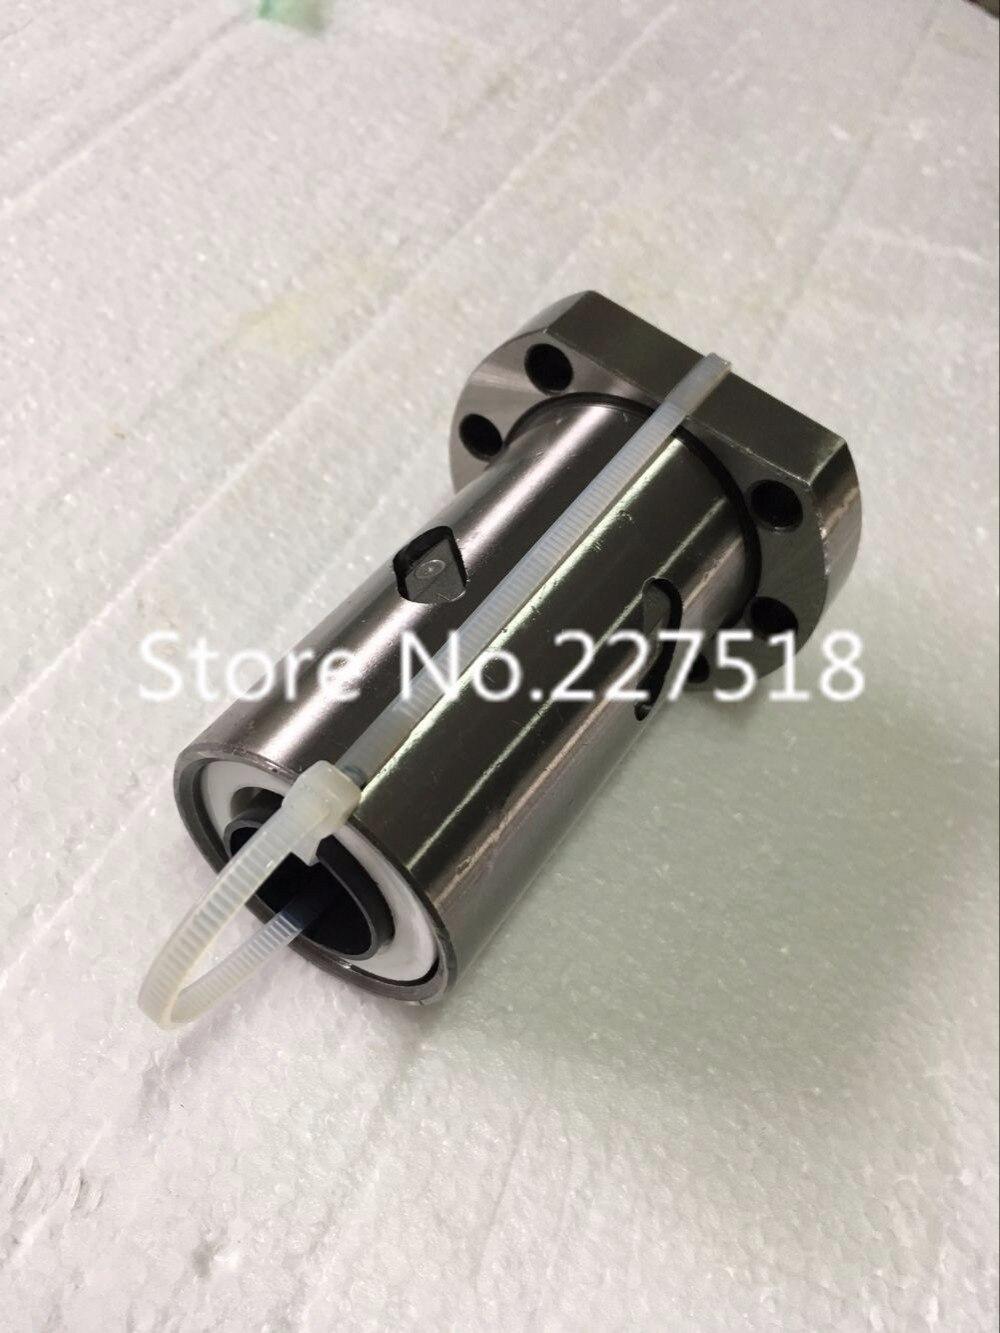 1pcs RM2510 SFU2510 ballscrew nut length 85mm single nut match use 2510 nut housing bracket CNC DIY Carving machine parts